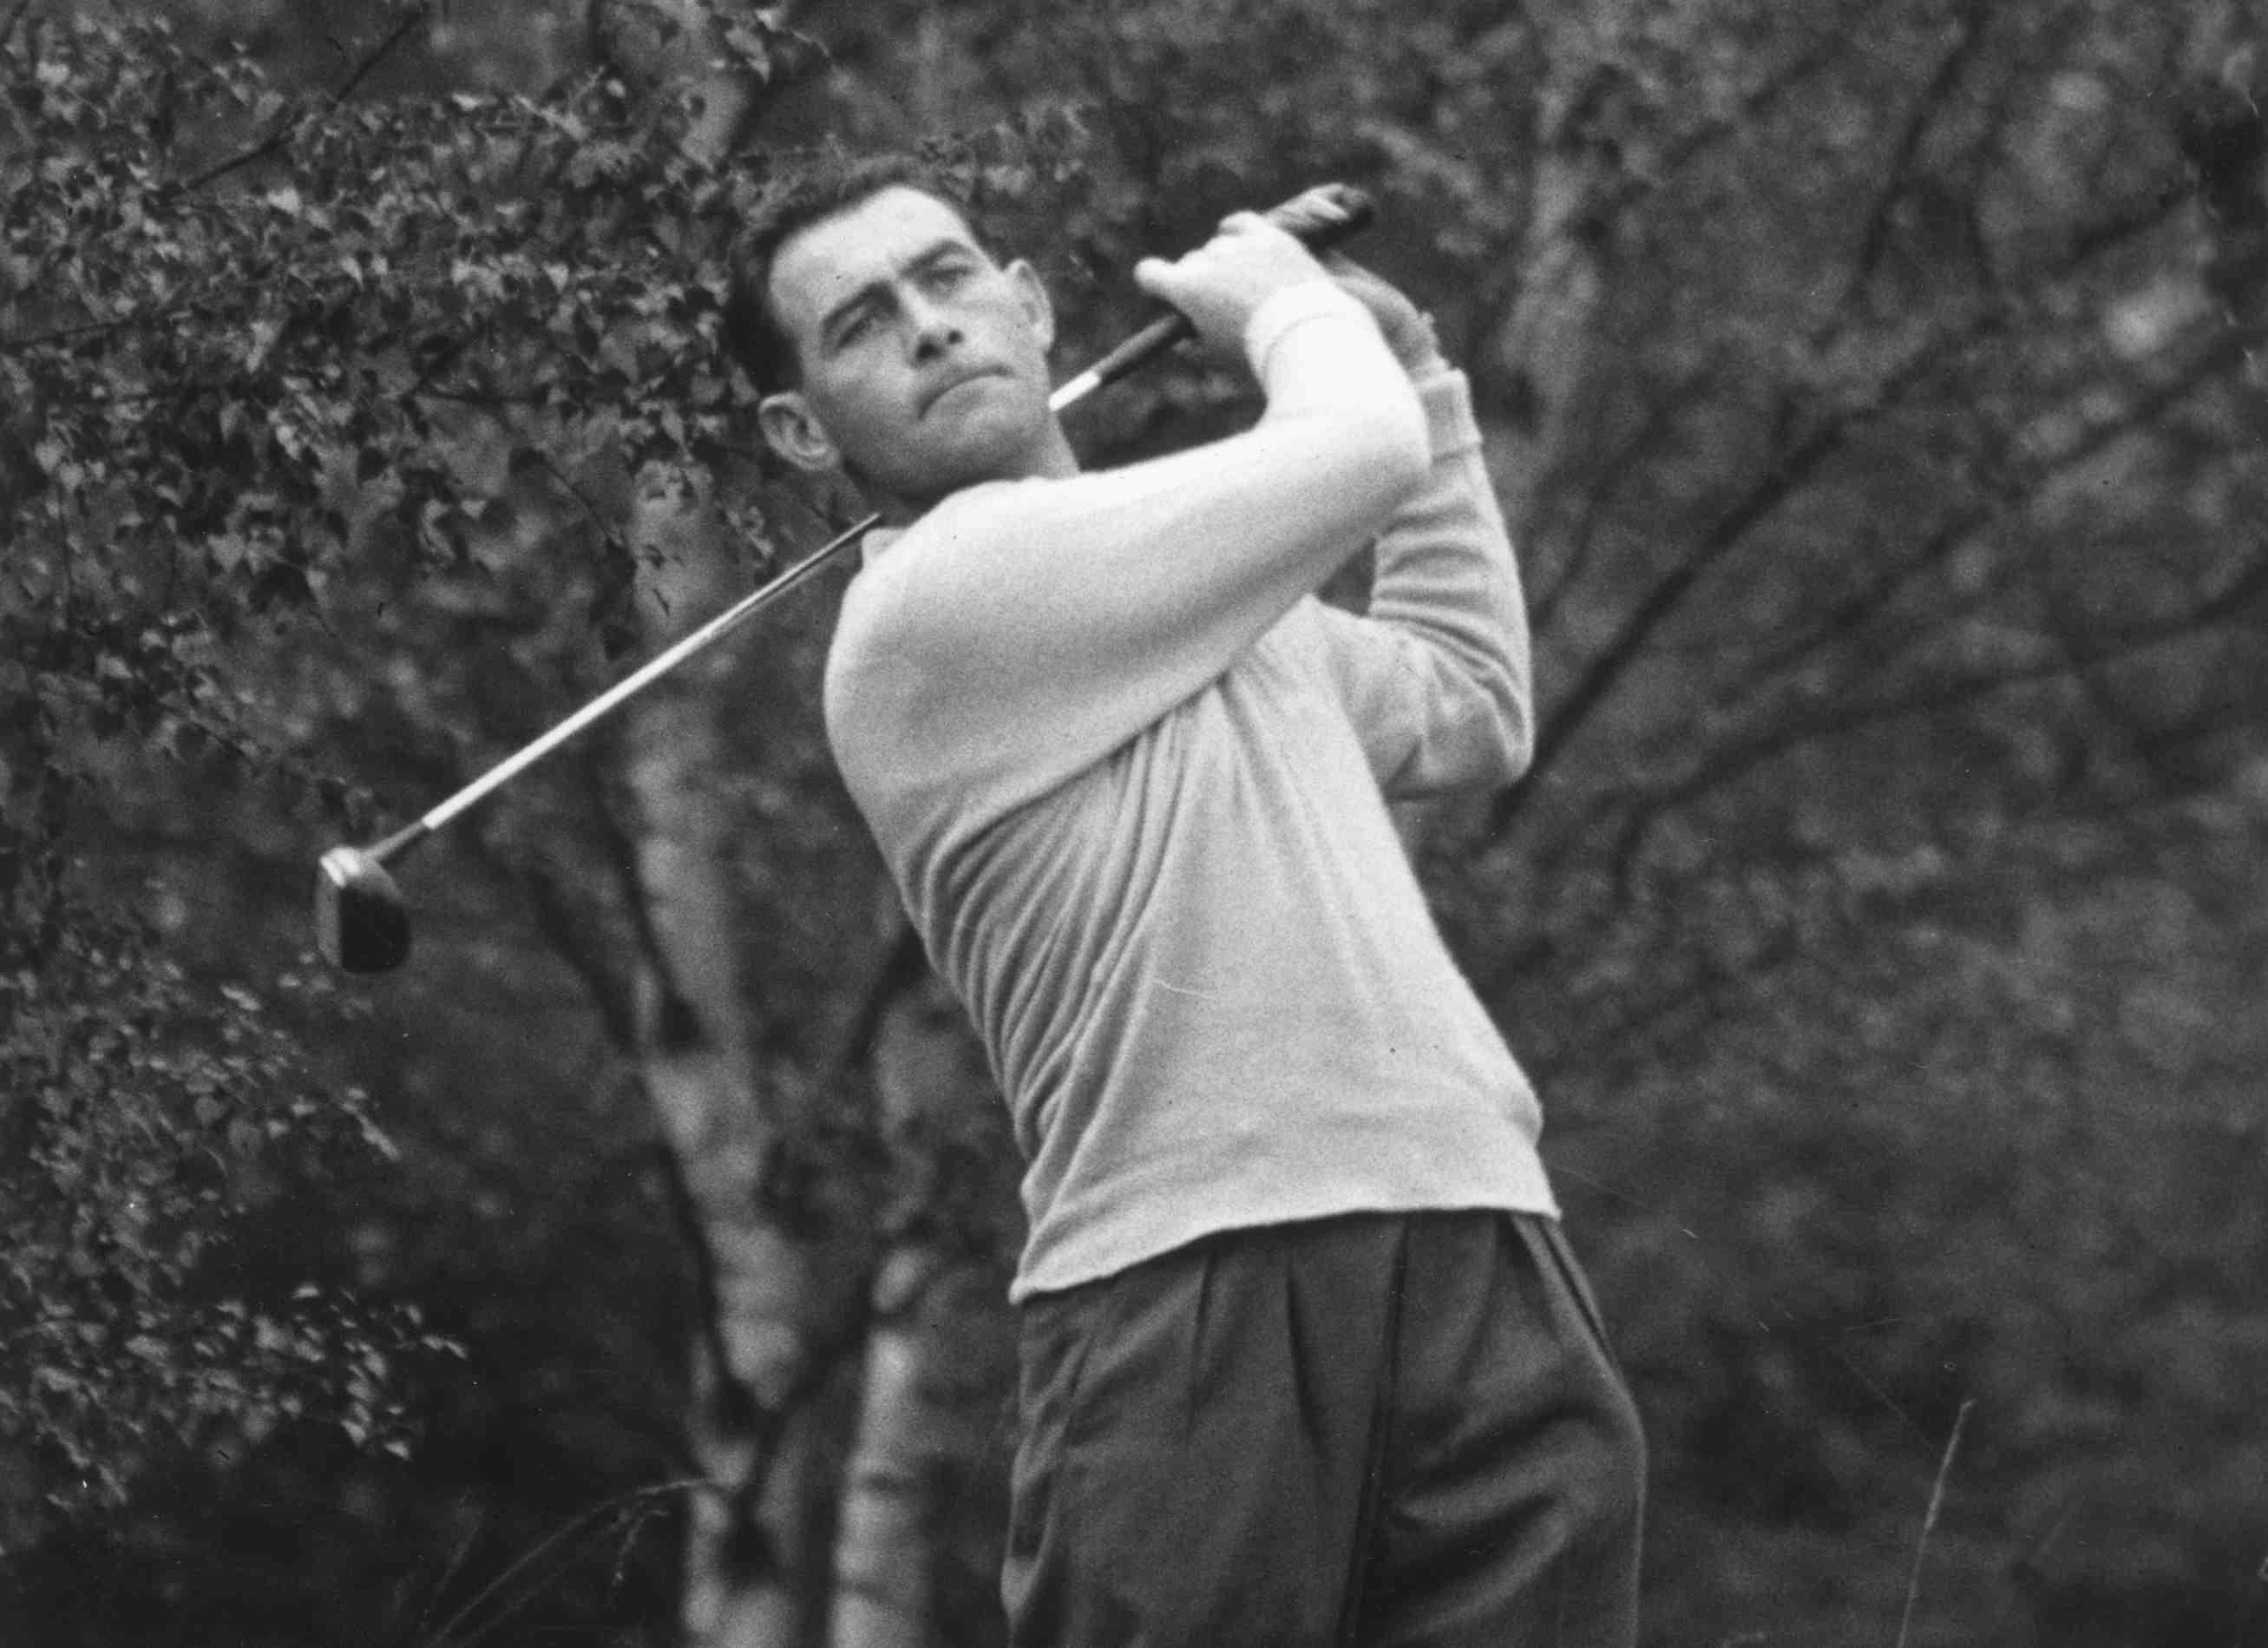 Christy O'Connor Sr. in 1957